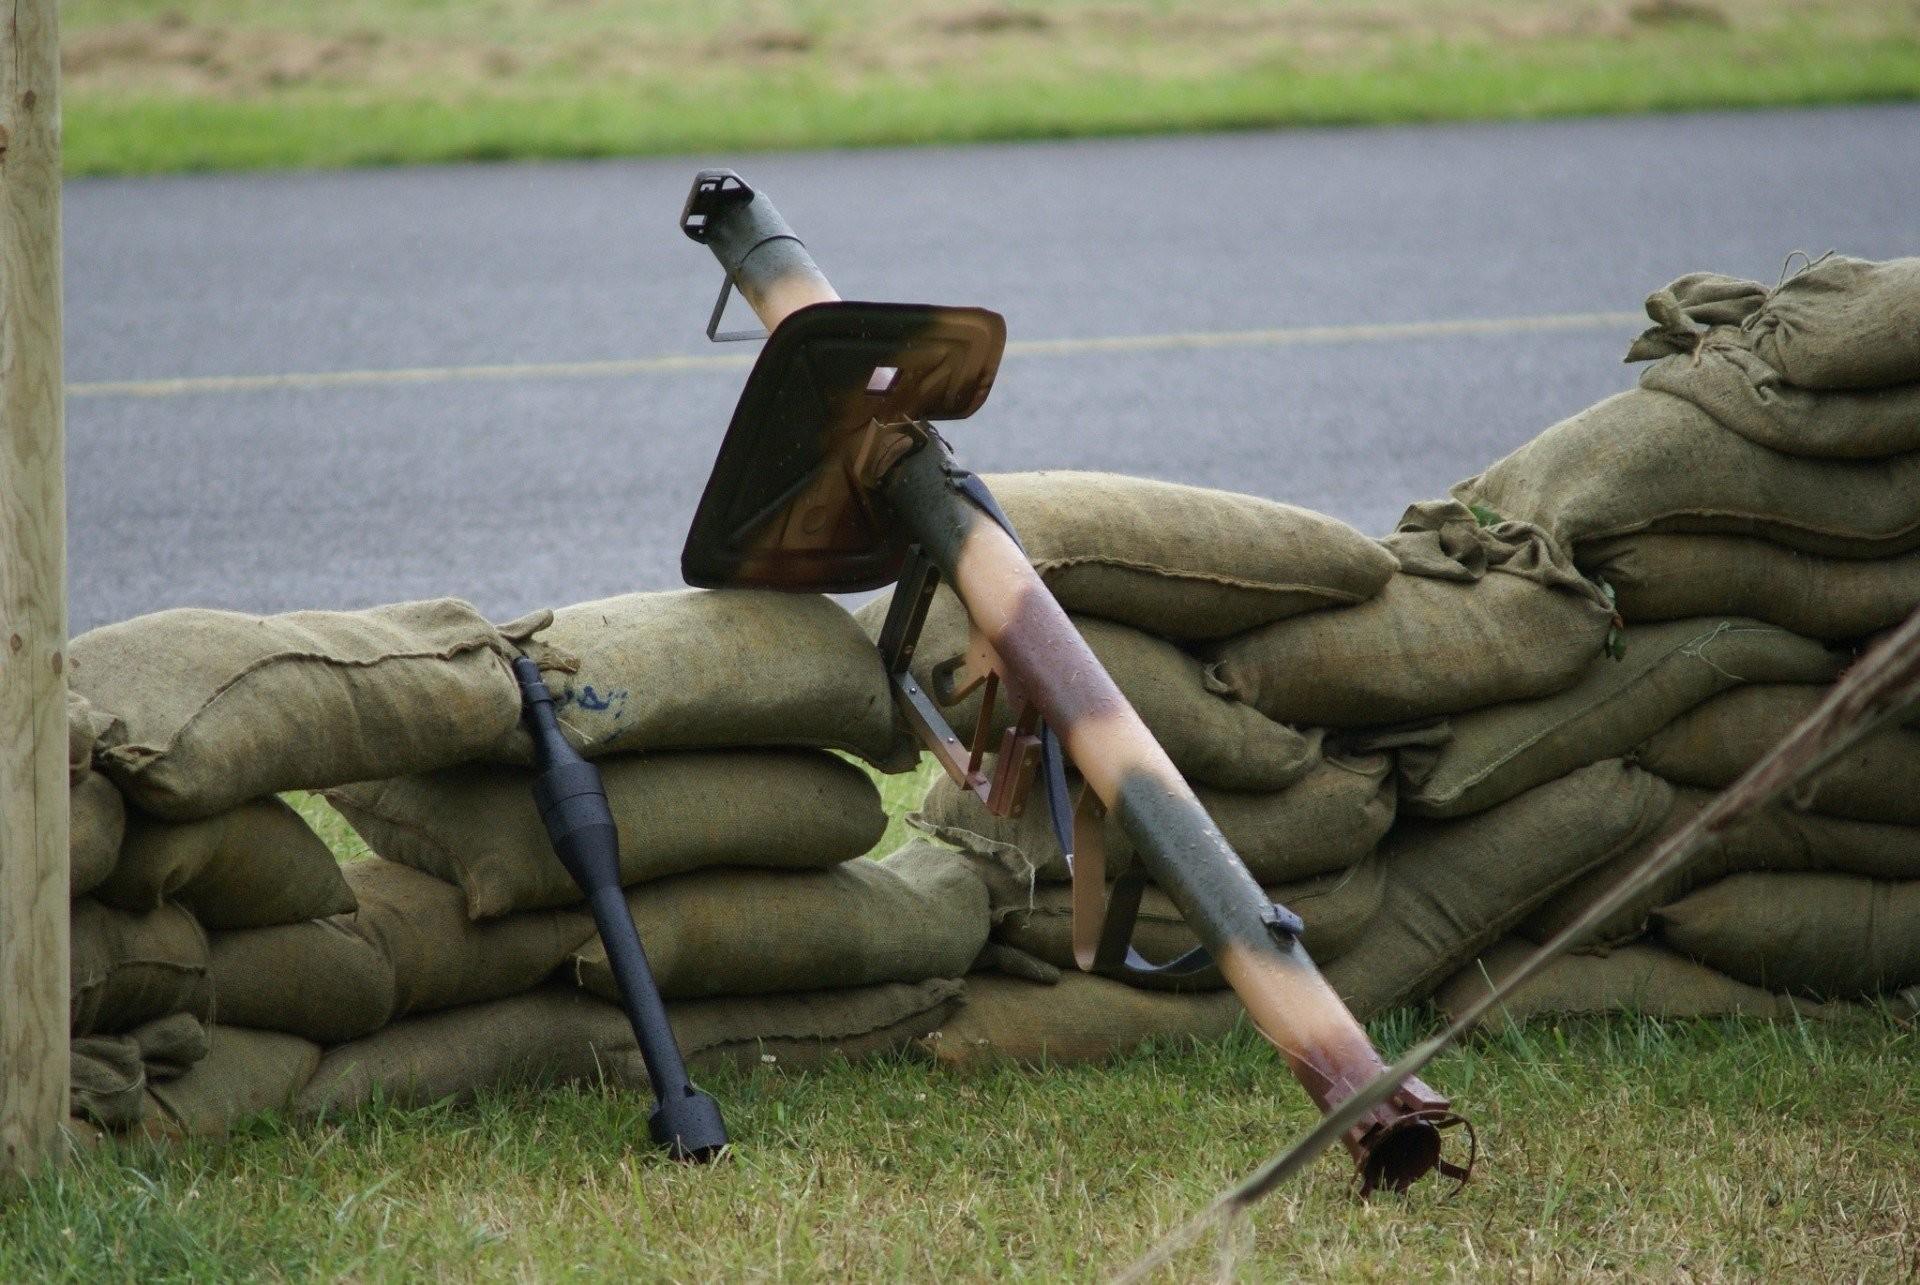 jet grenade german panzerschreck anti-tank special grenade manual cumulative